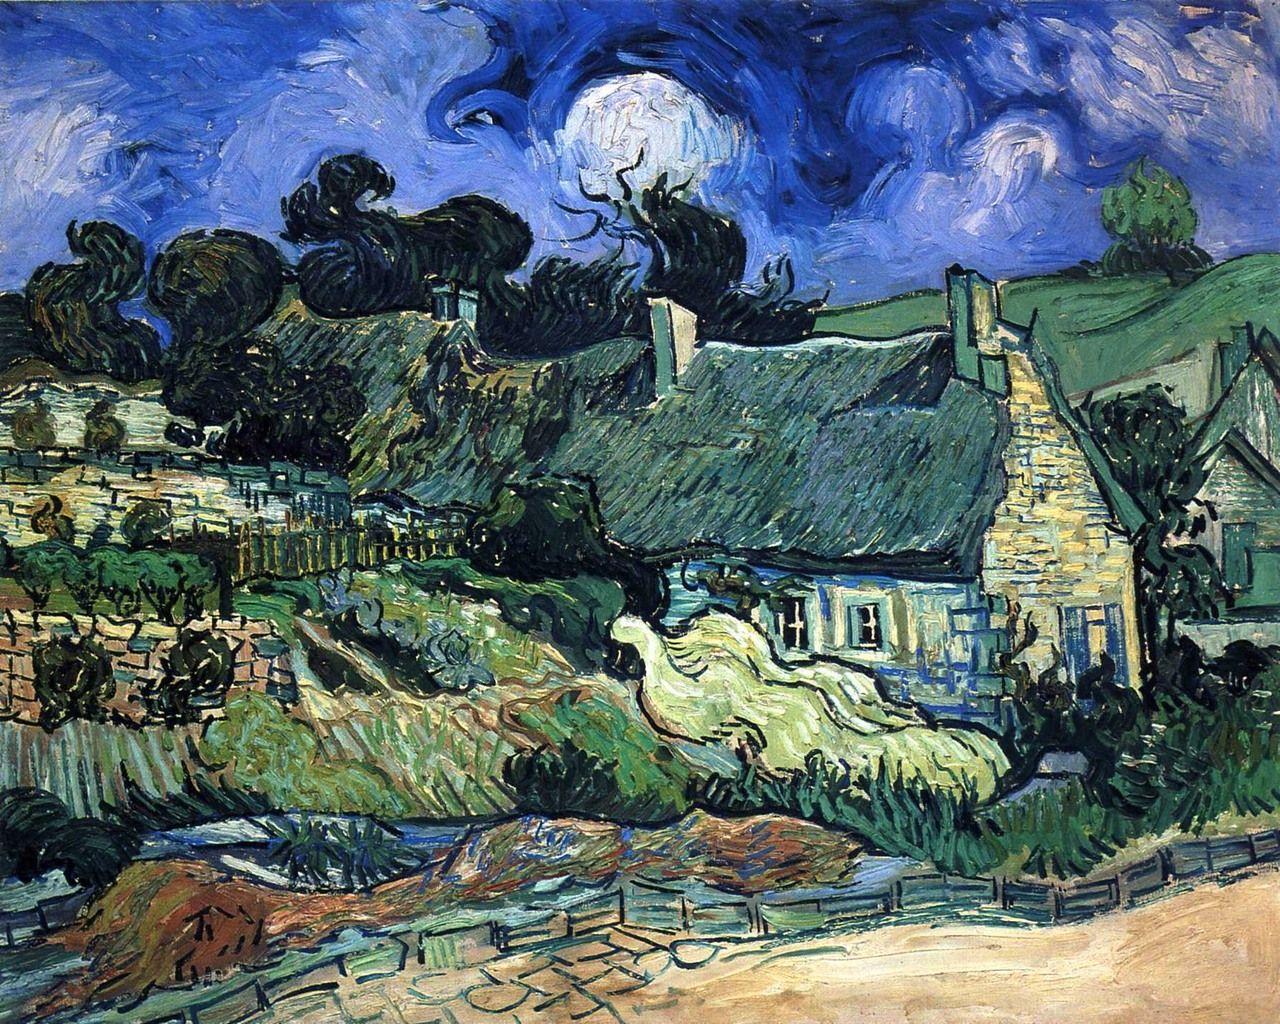 Van Gogh Van Gogh Pinterest Van Gogh And Vans